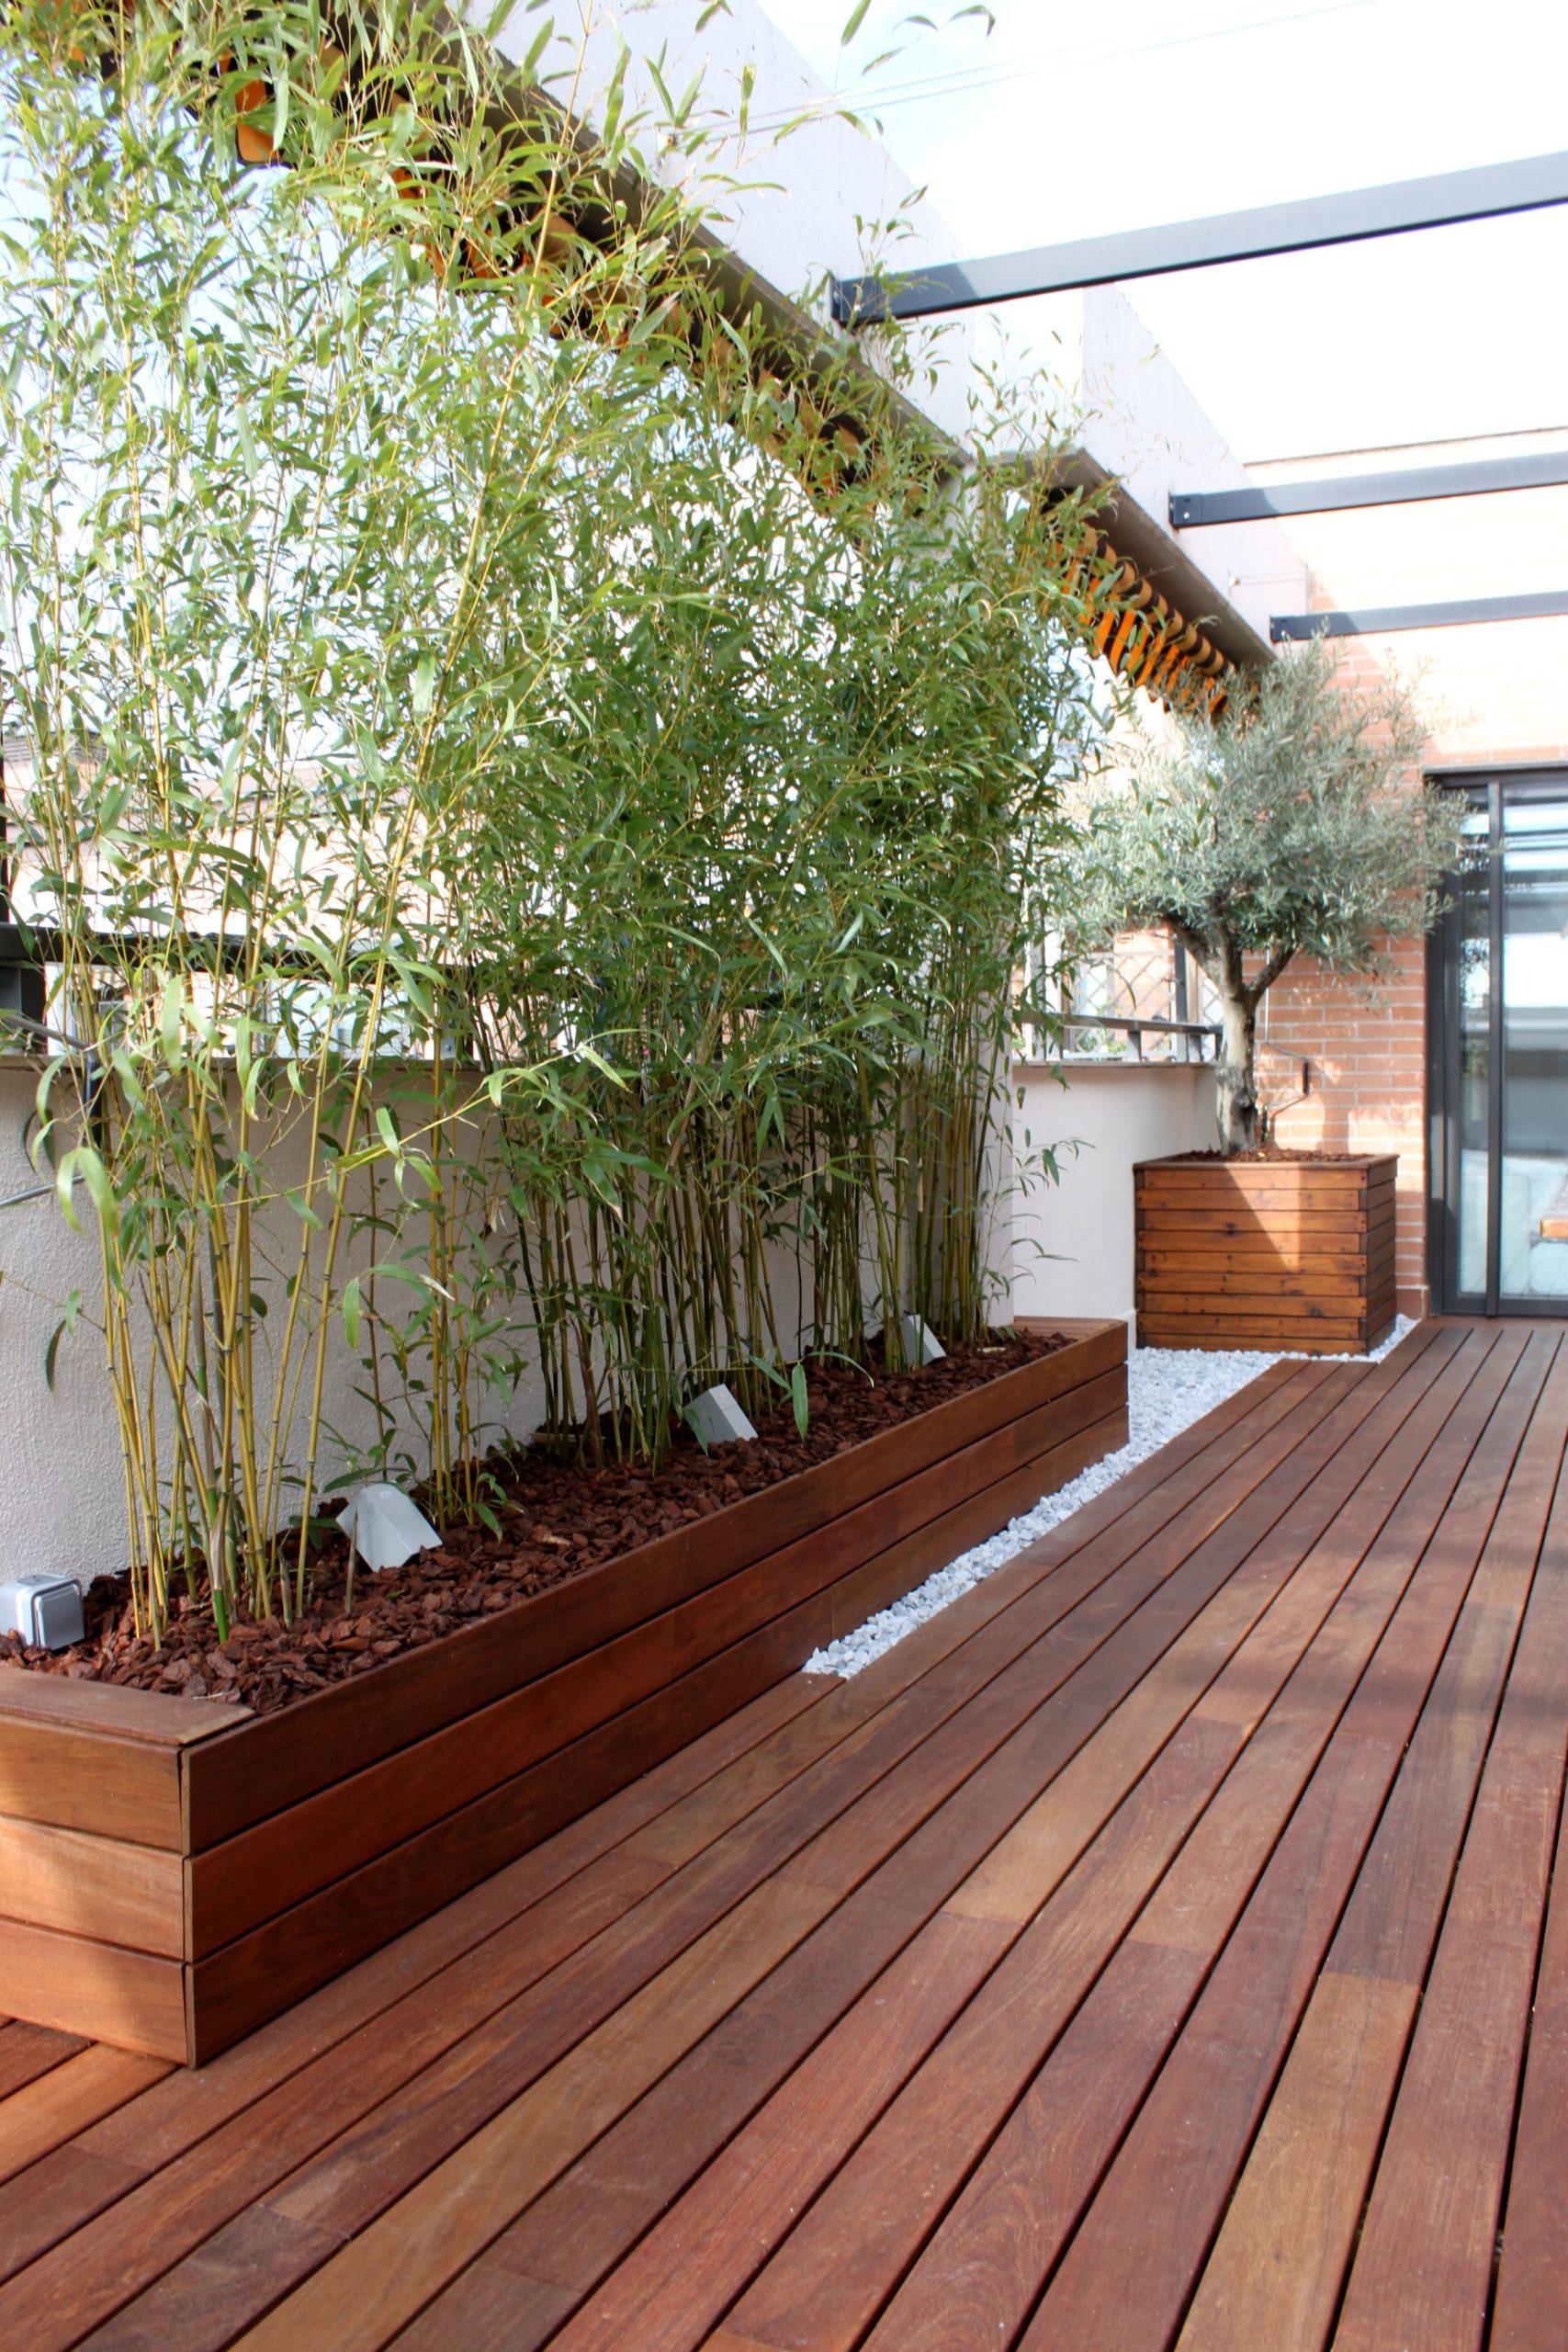 Jardinera De Madera De Ipe Integrada Con El Pavimento ... tout Jardinieres Beton Pour Jardin